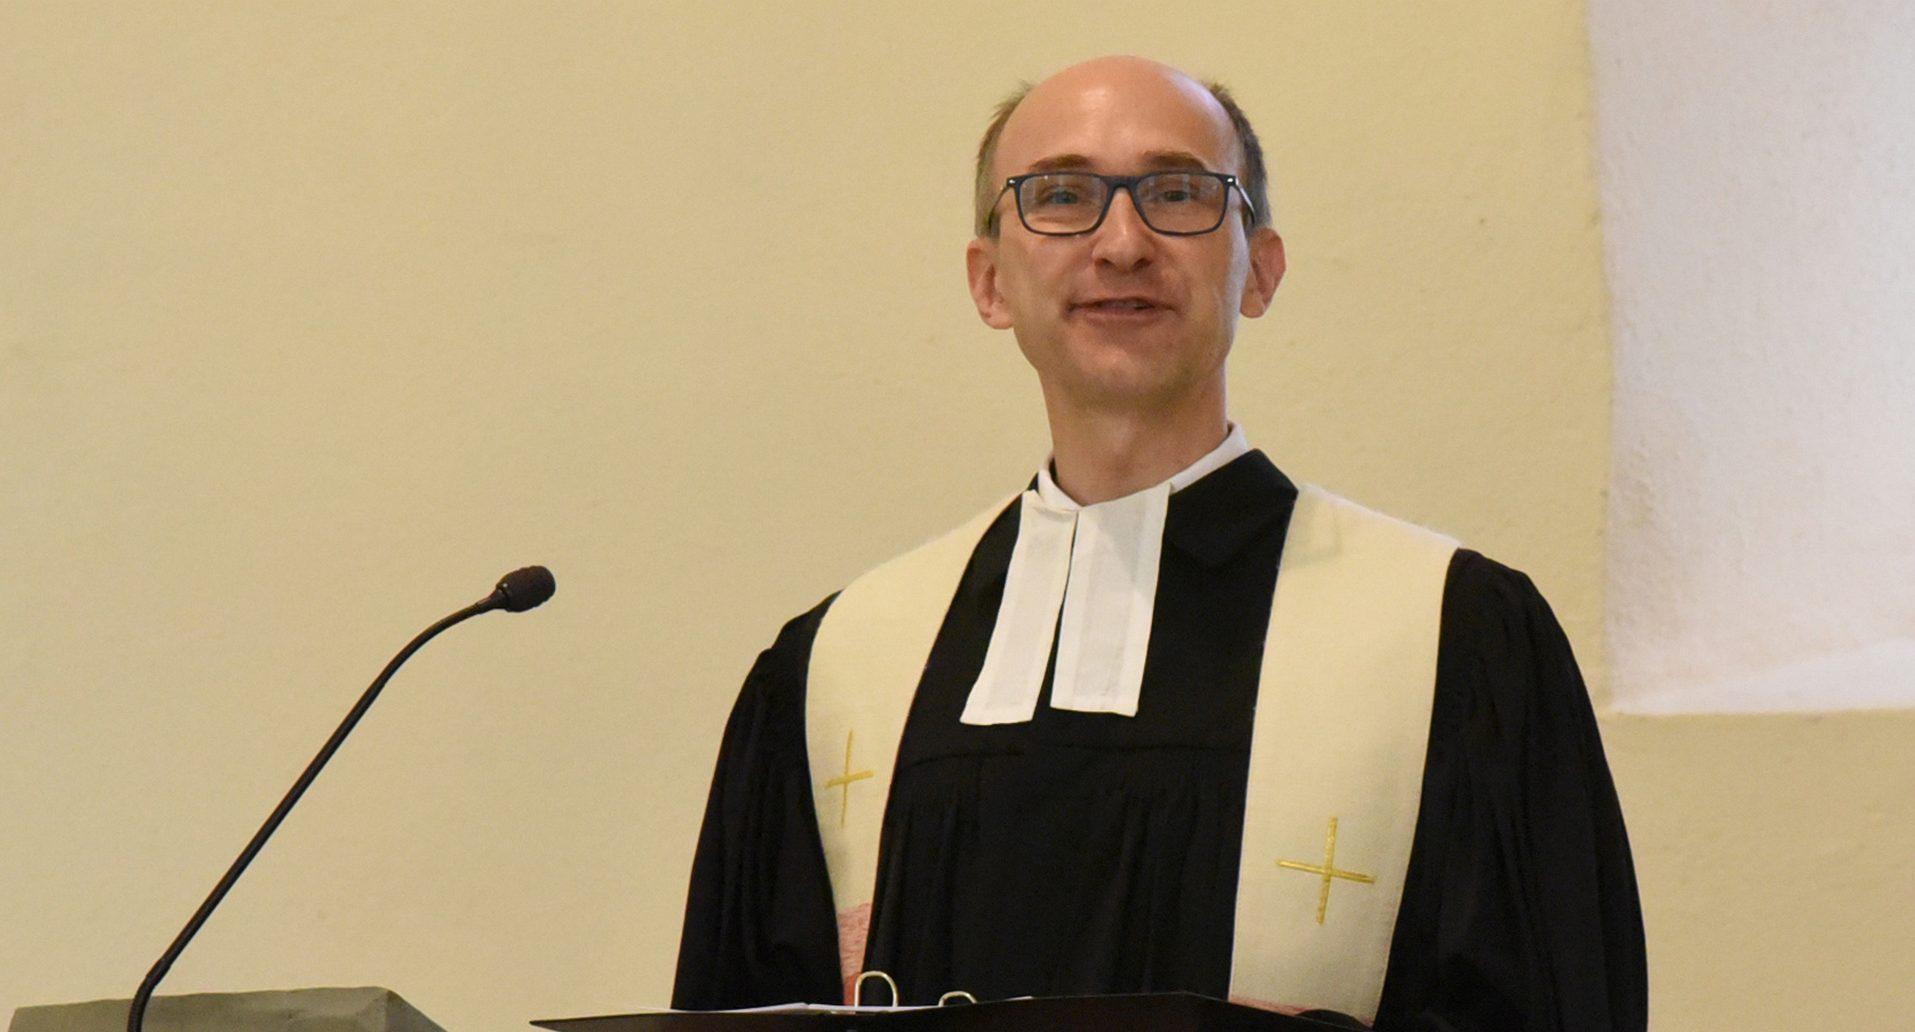 Pfarrers Ulrich Krause